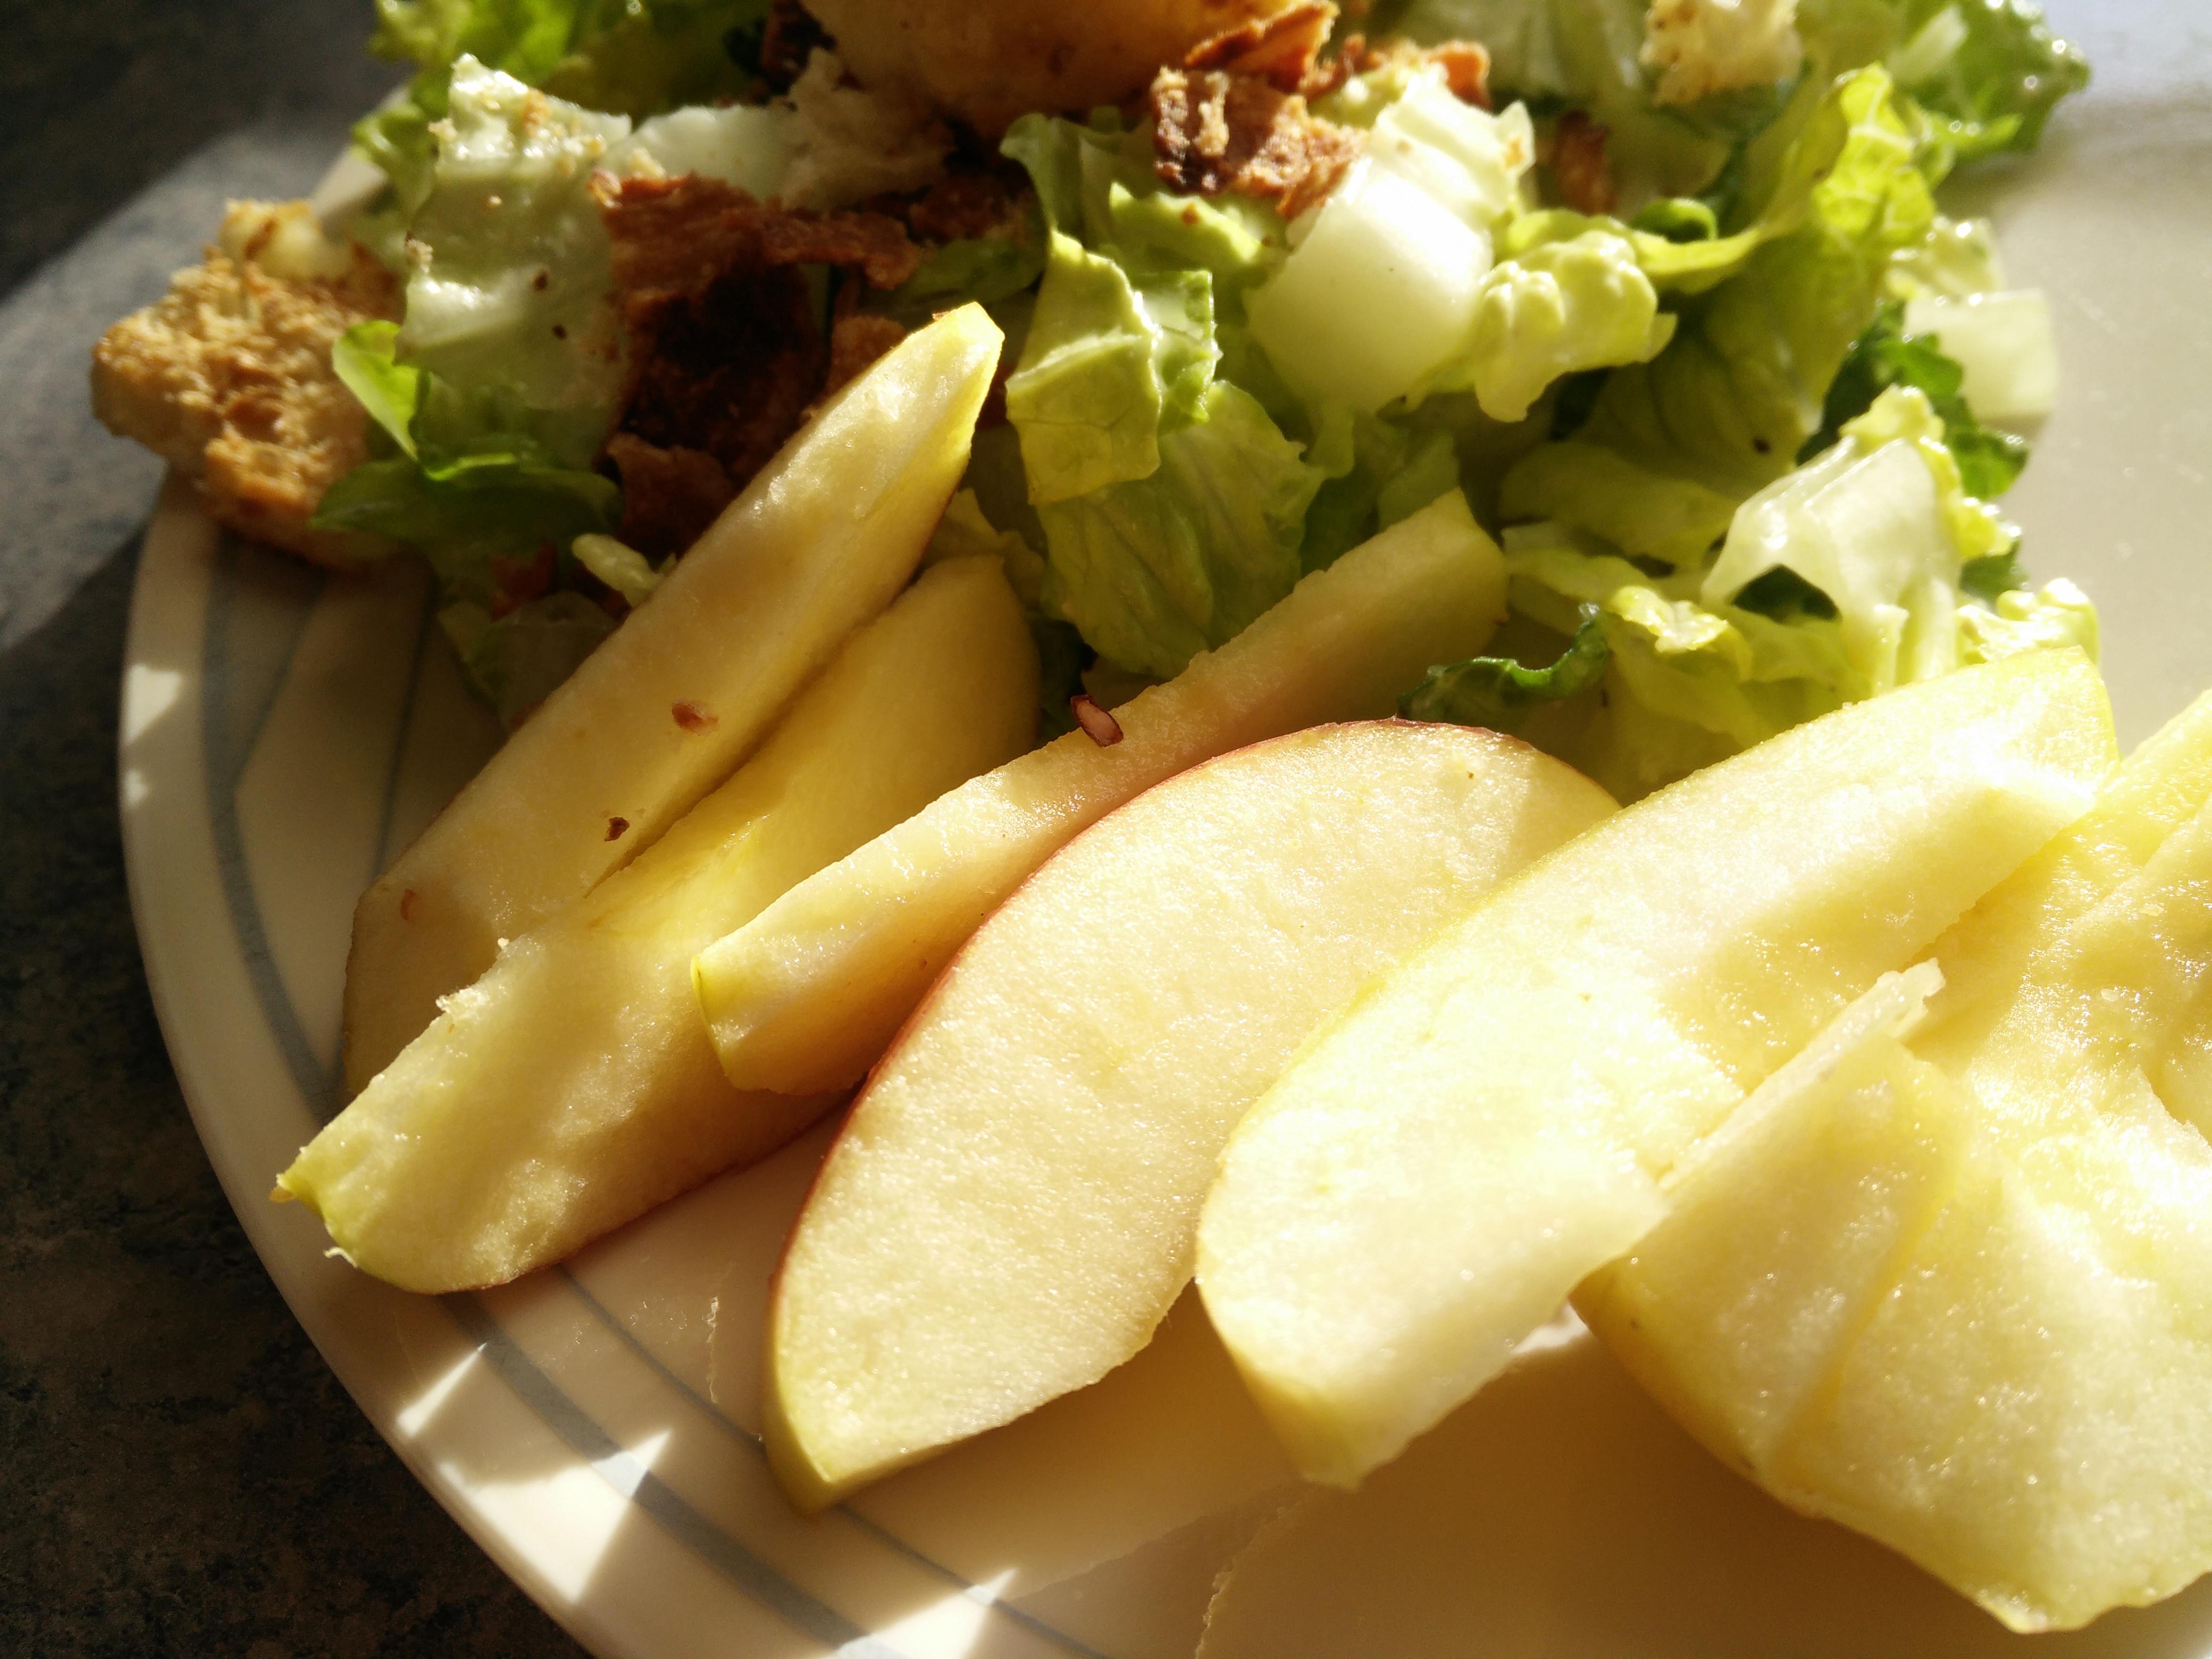 ambrosia with kale salad